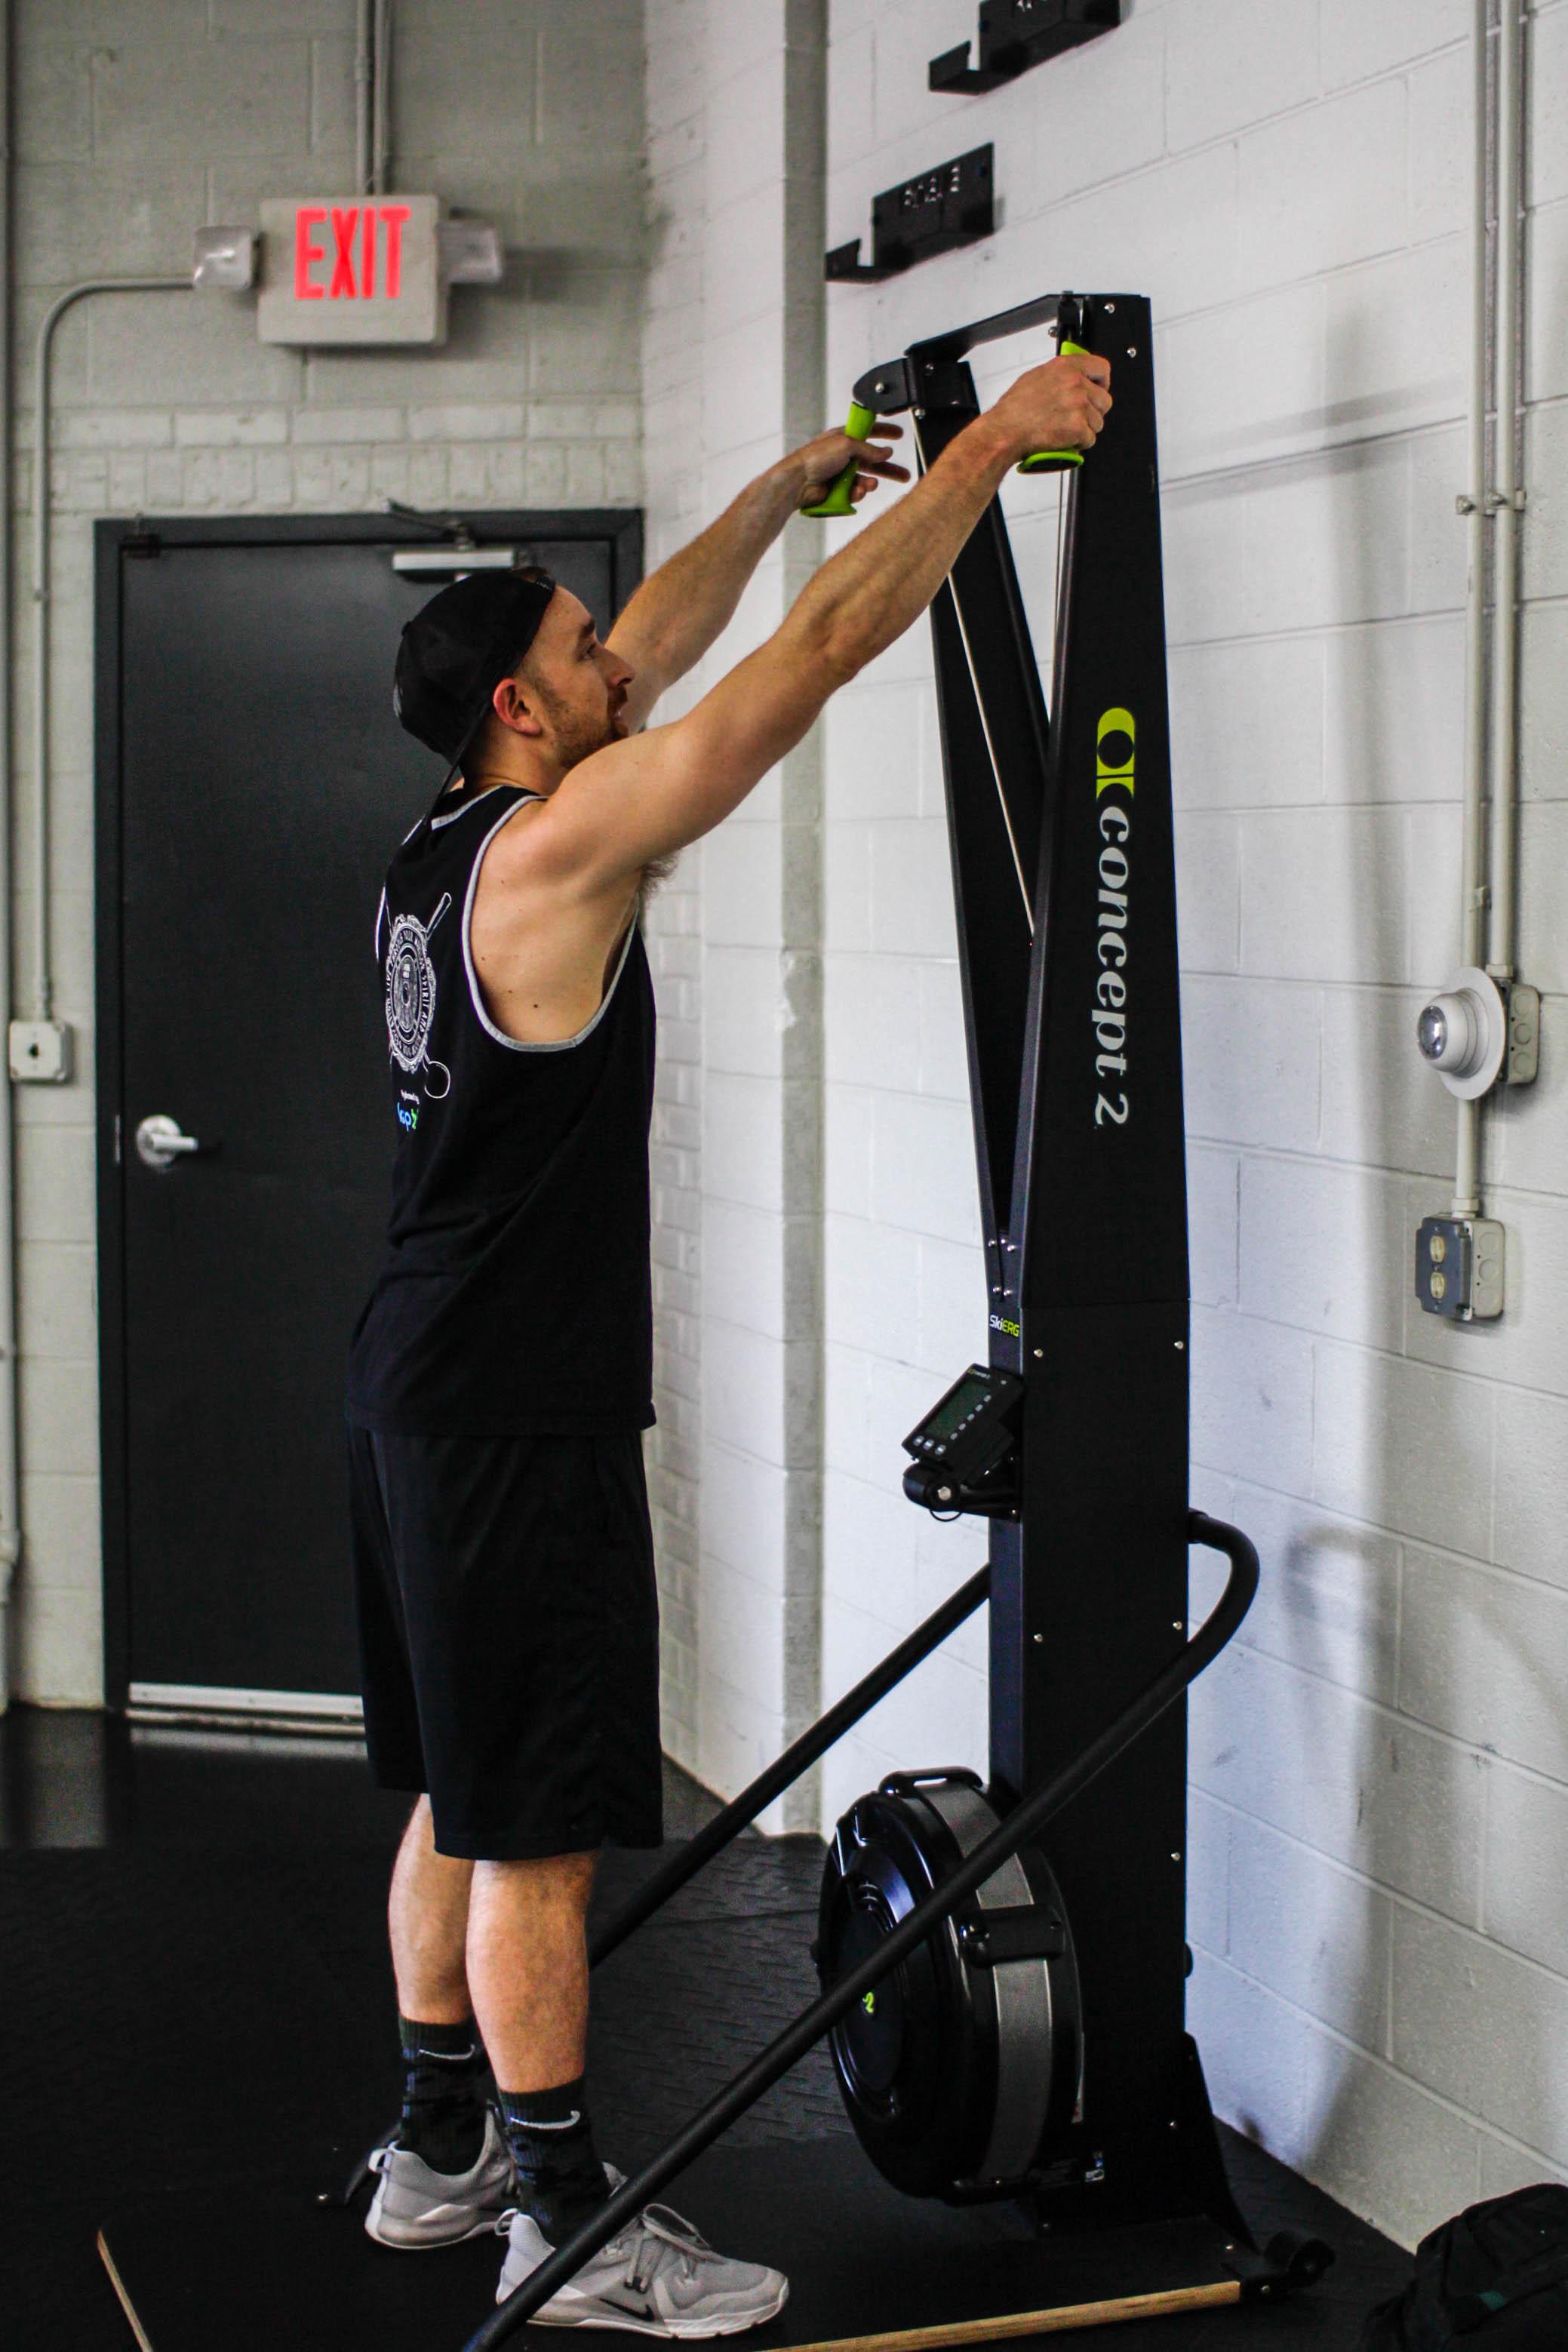 Skier Cardio Workout Machine at Midwest Strength + Performance, a gym near Wheaton, Illinois.